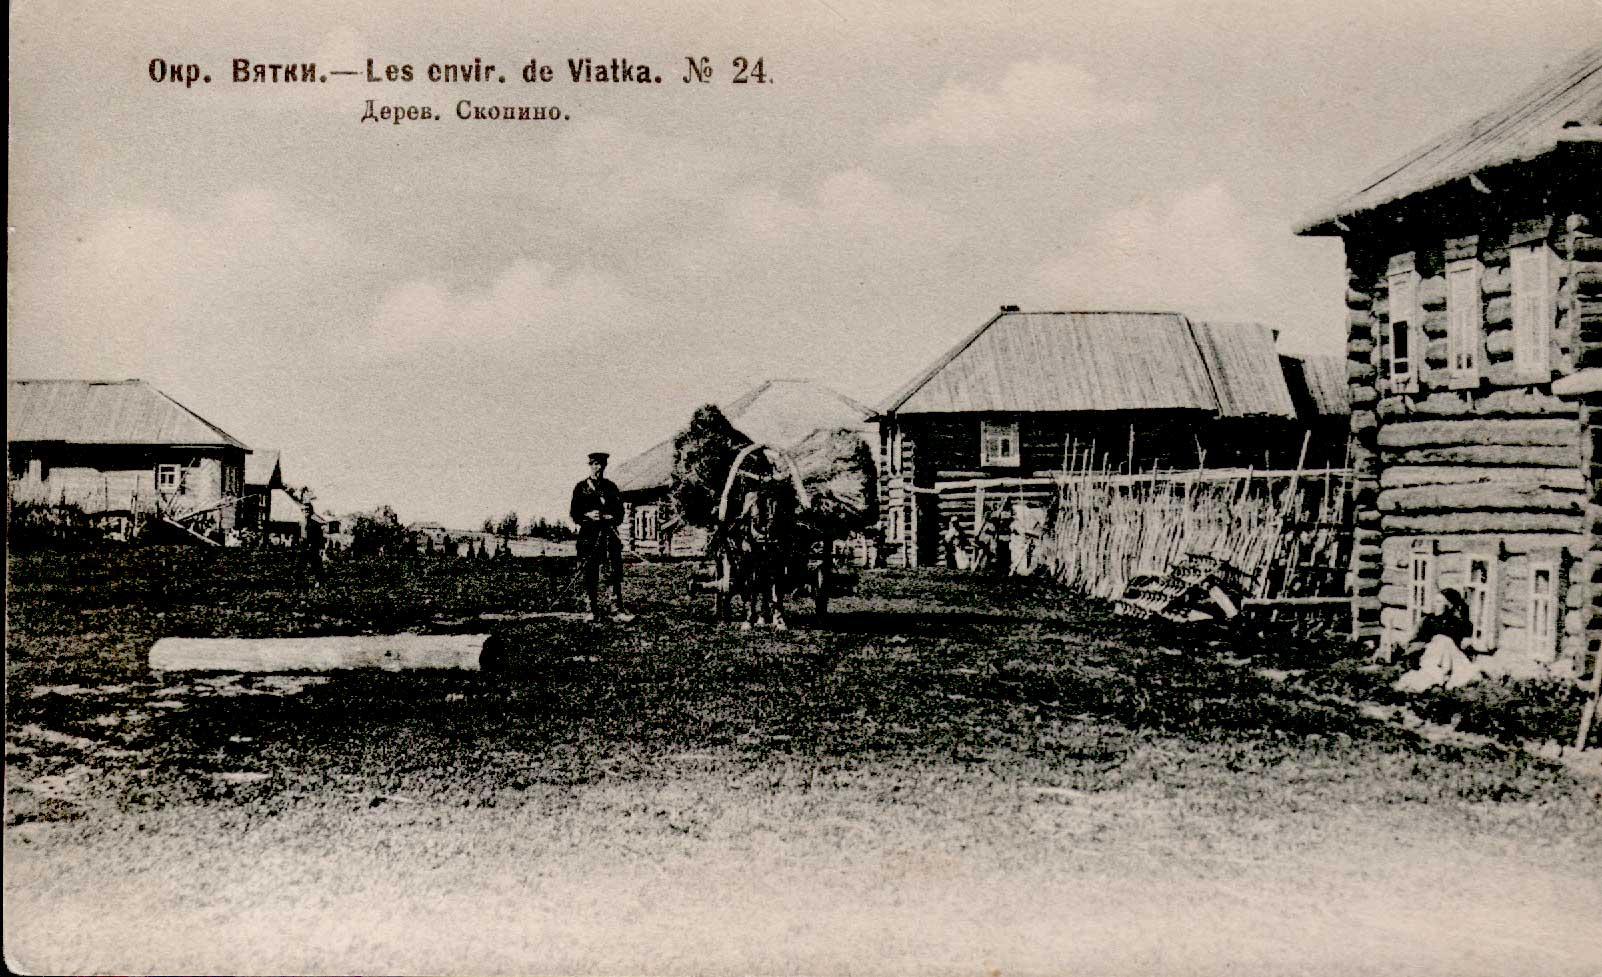 Окрестности Вятки. Деревня Скопино